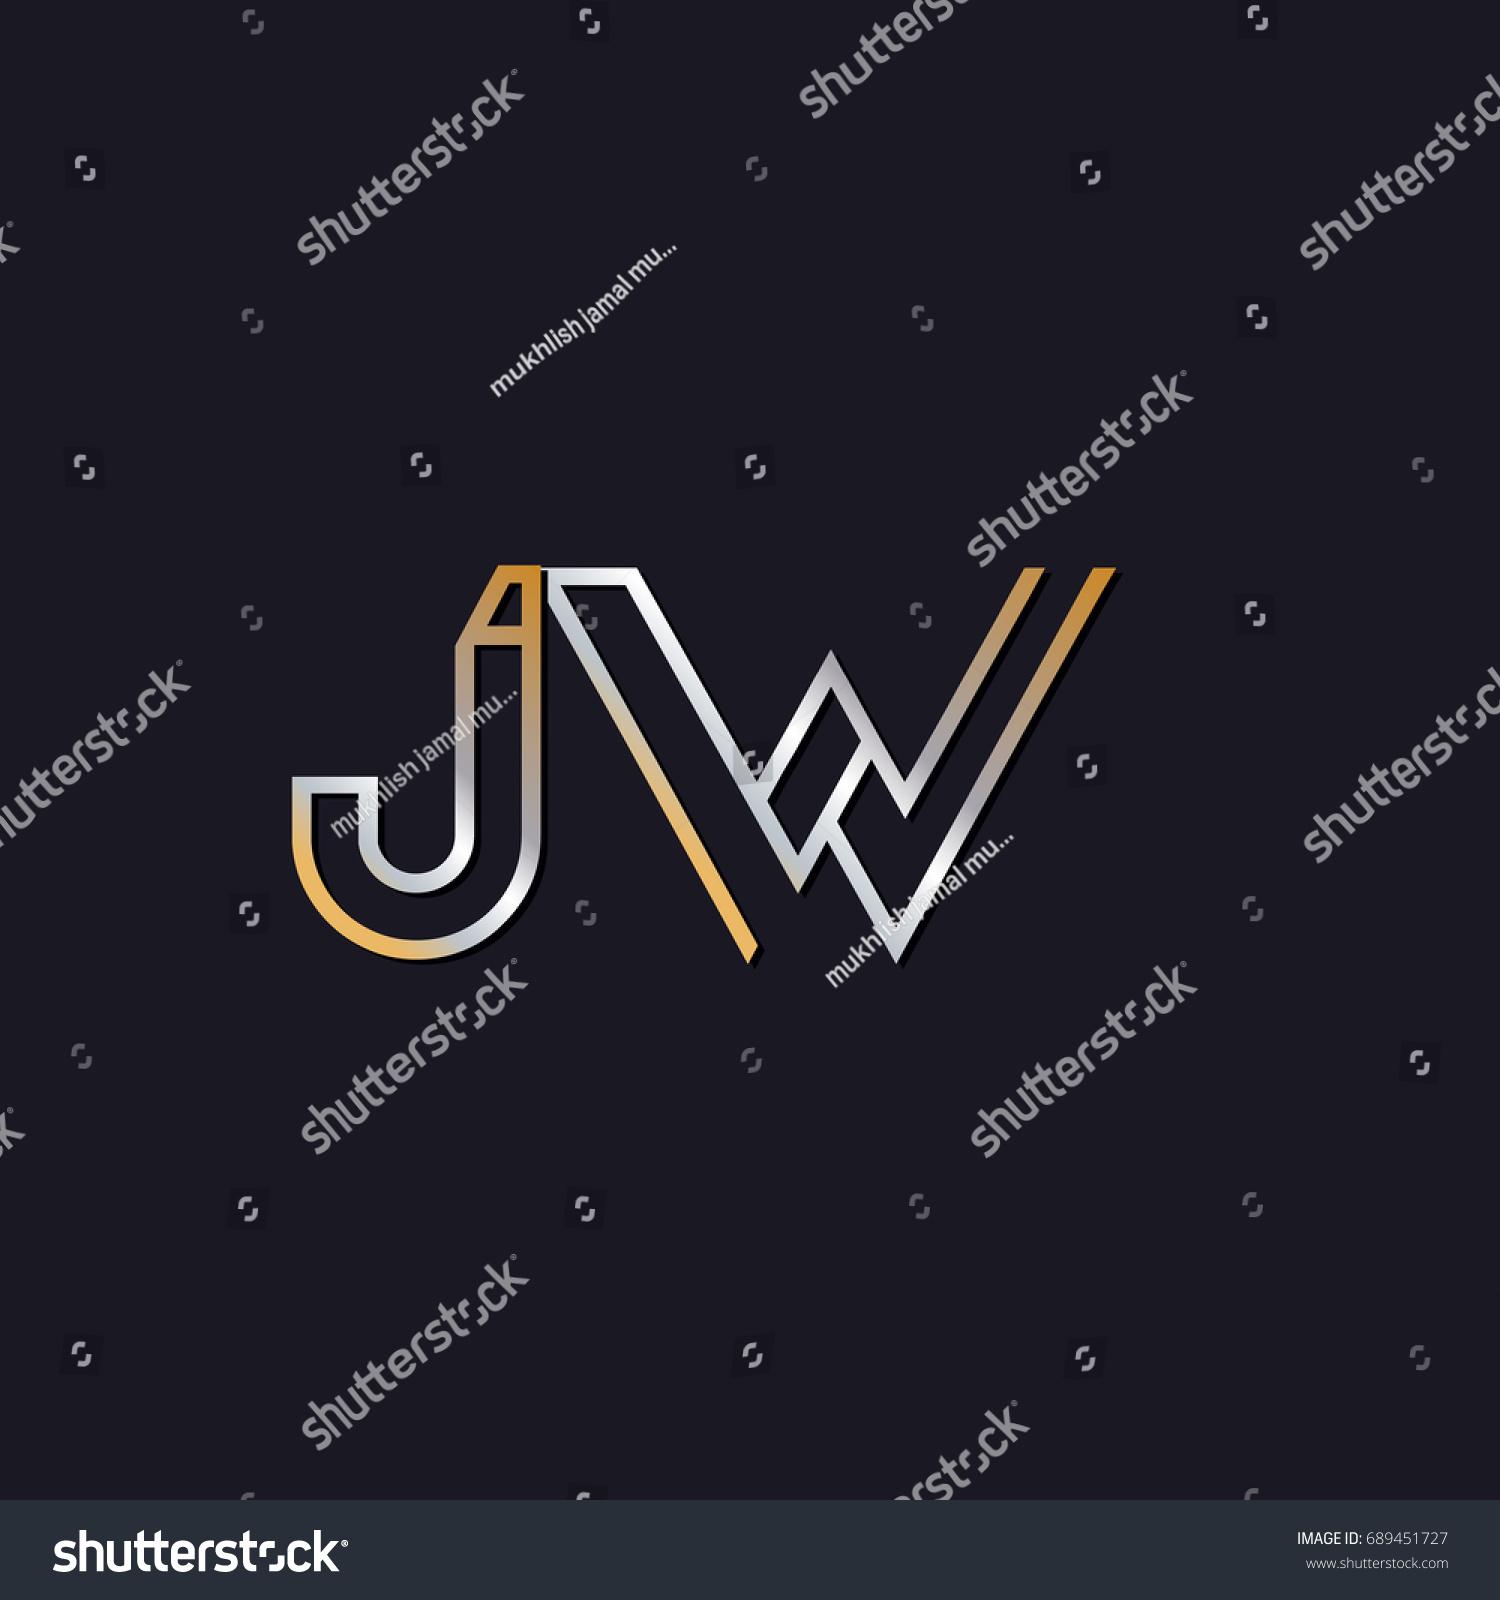 Jw Initial Letters Elegant Logo Golden Stock Vector Royalty 1500x1600